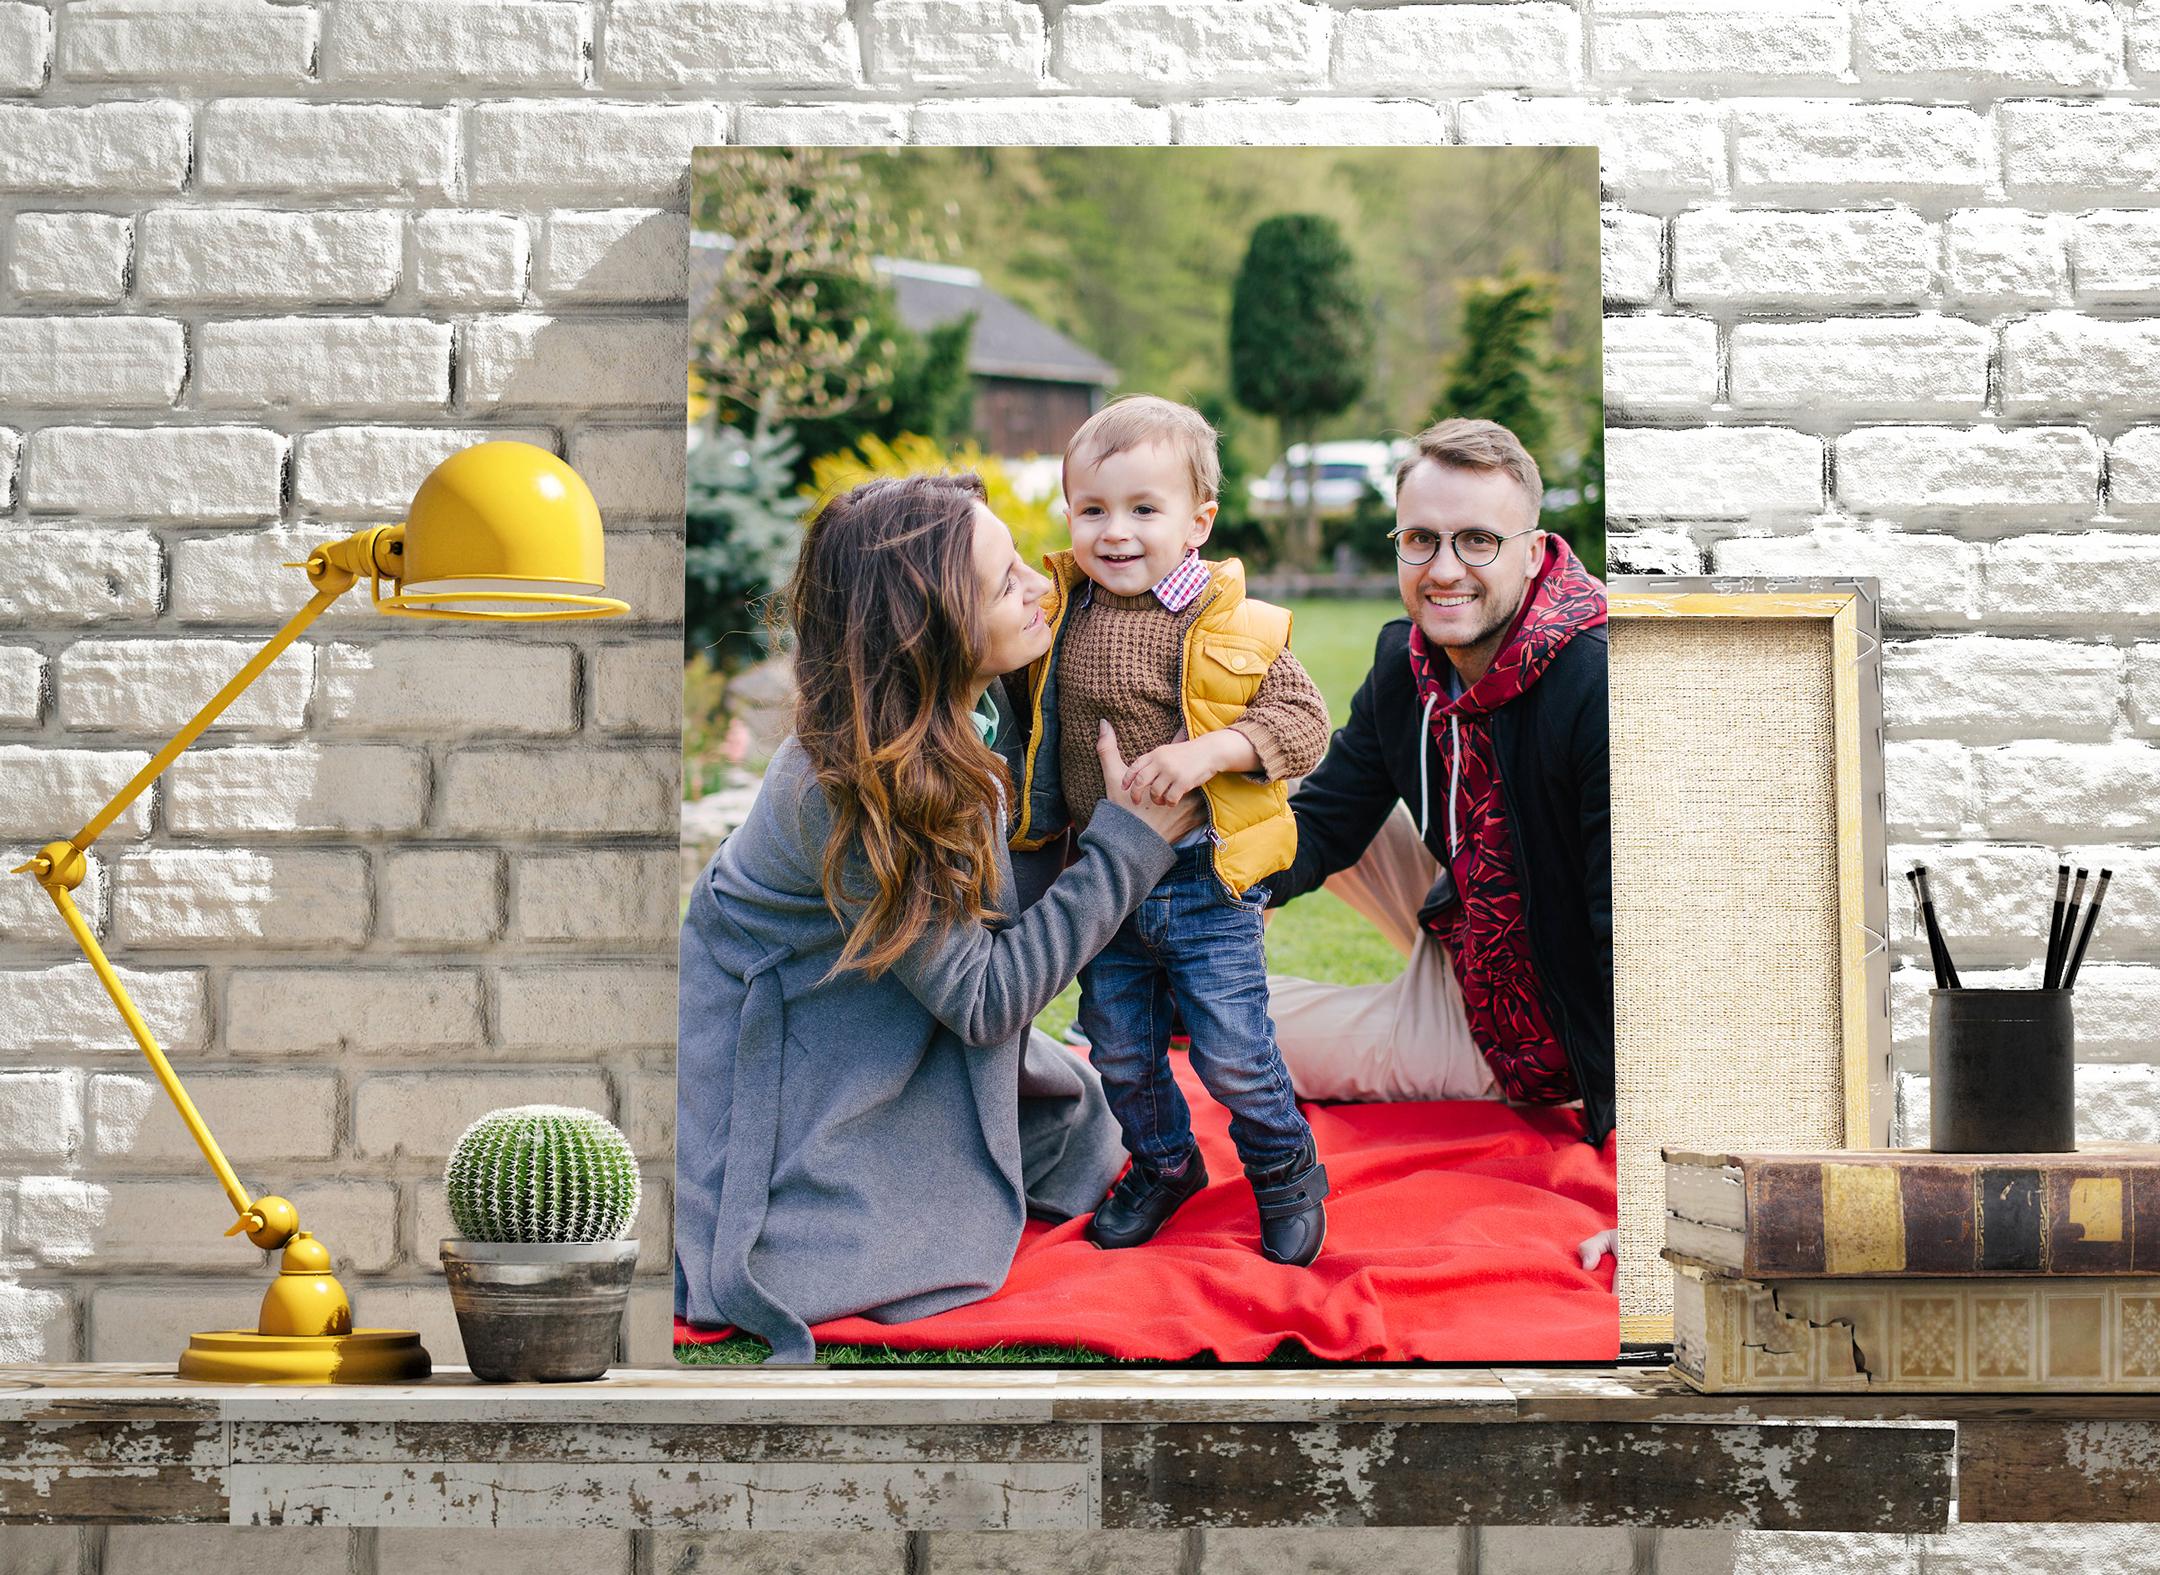 Canvas-Home-decor-22.jpg